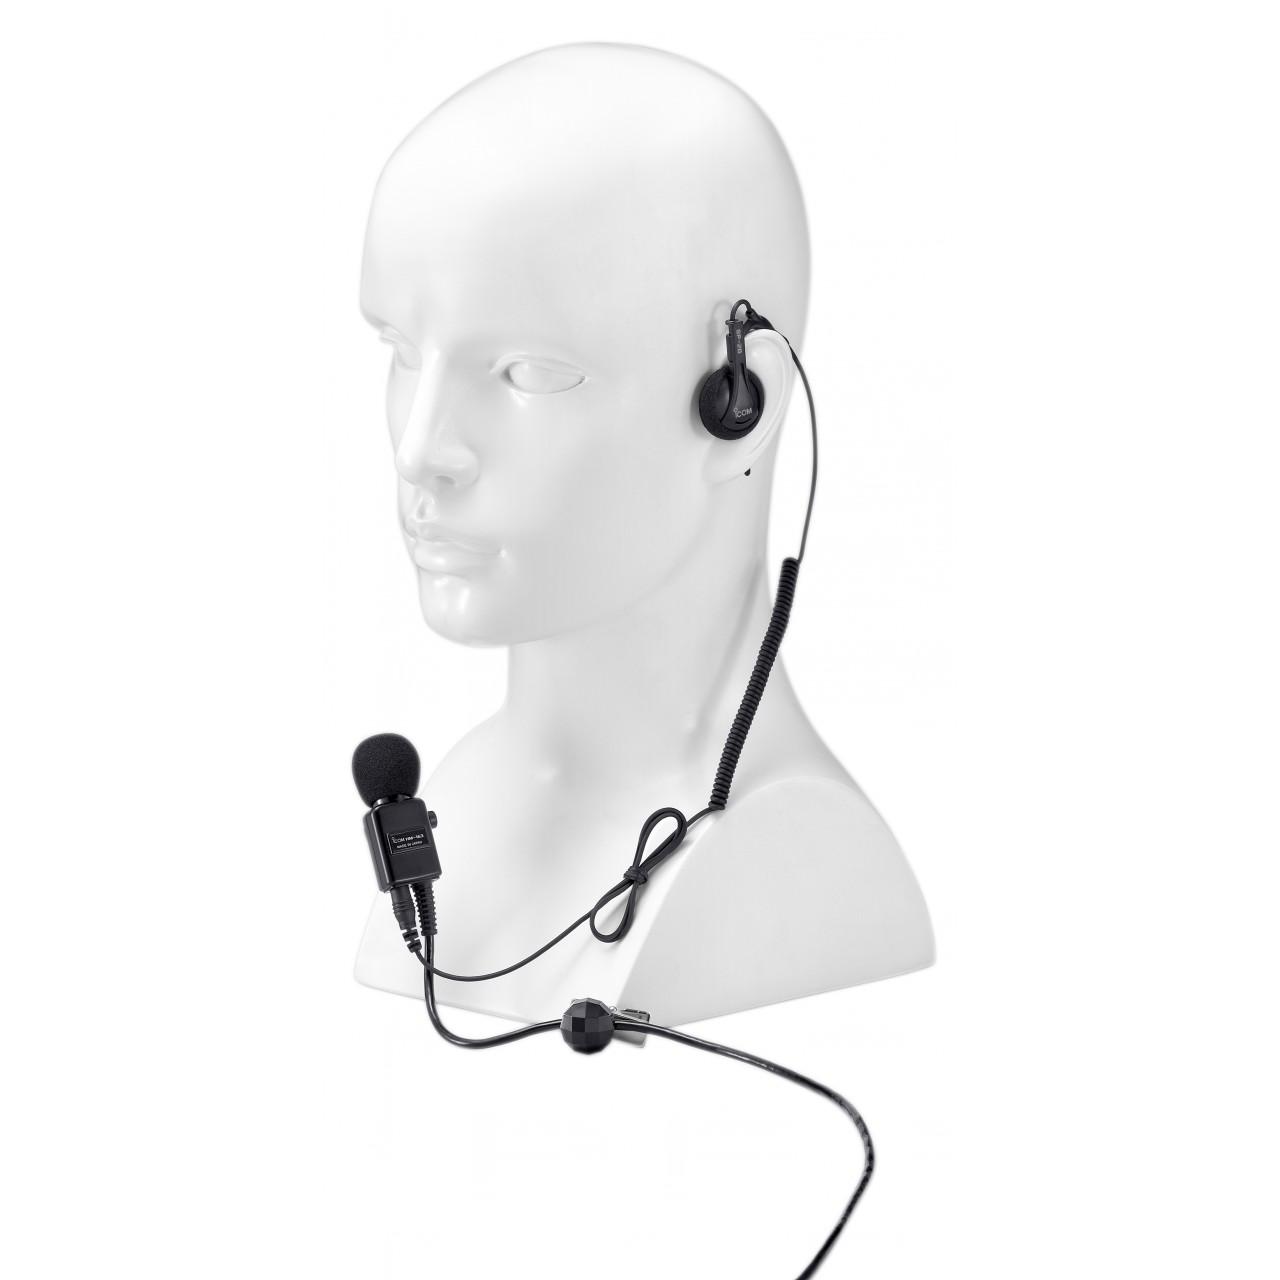 SP-28 Headsets and earphones - ICOM